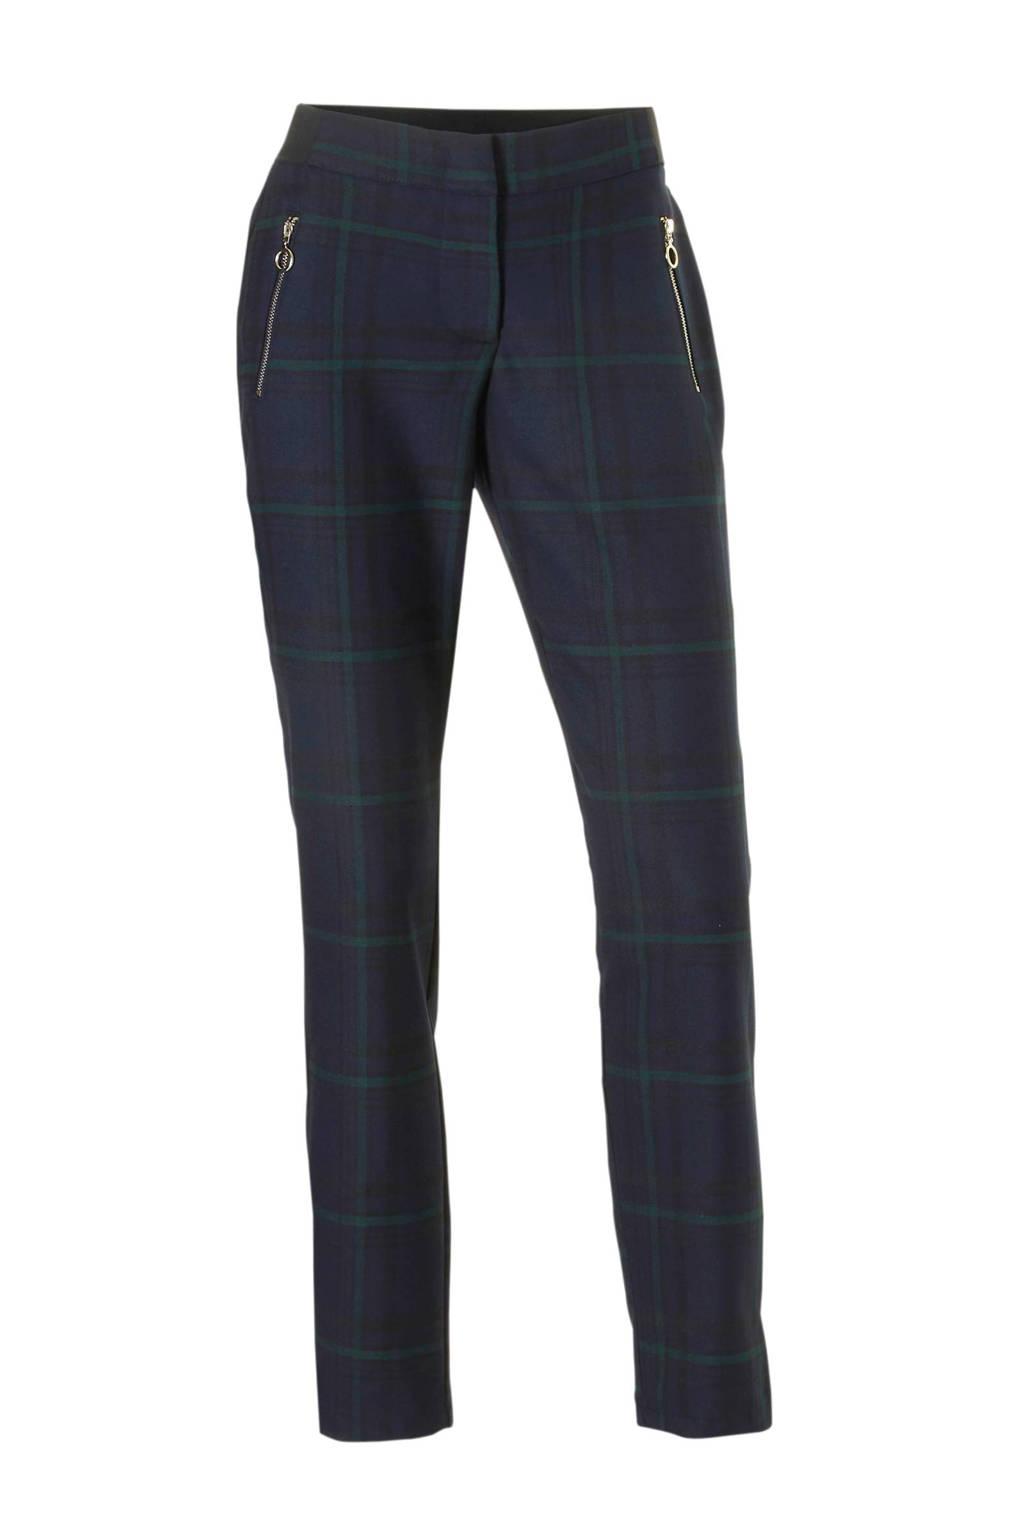 C&A YSS Shop broek met ruitprint blauw, Donkerblauw